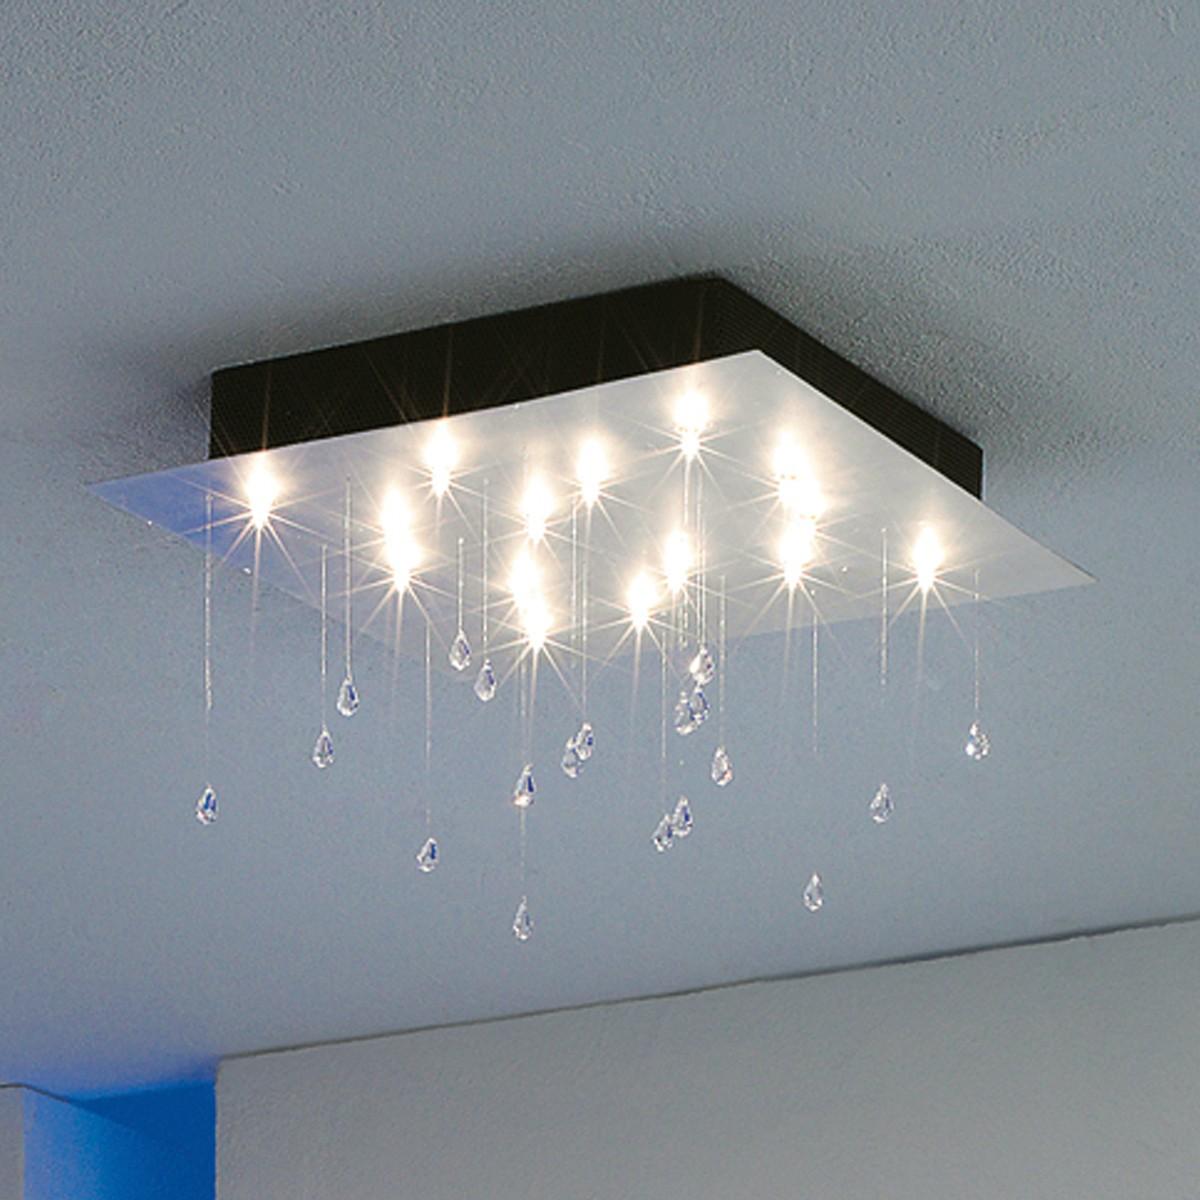 Escale Crystal Rain Deckenleuchte, Blattaluminium, 40 x 40 cm